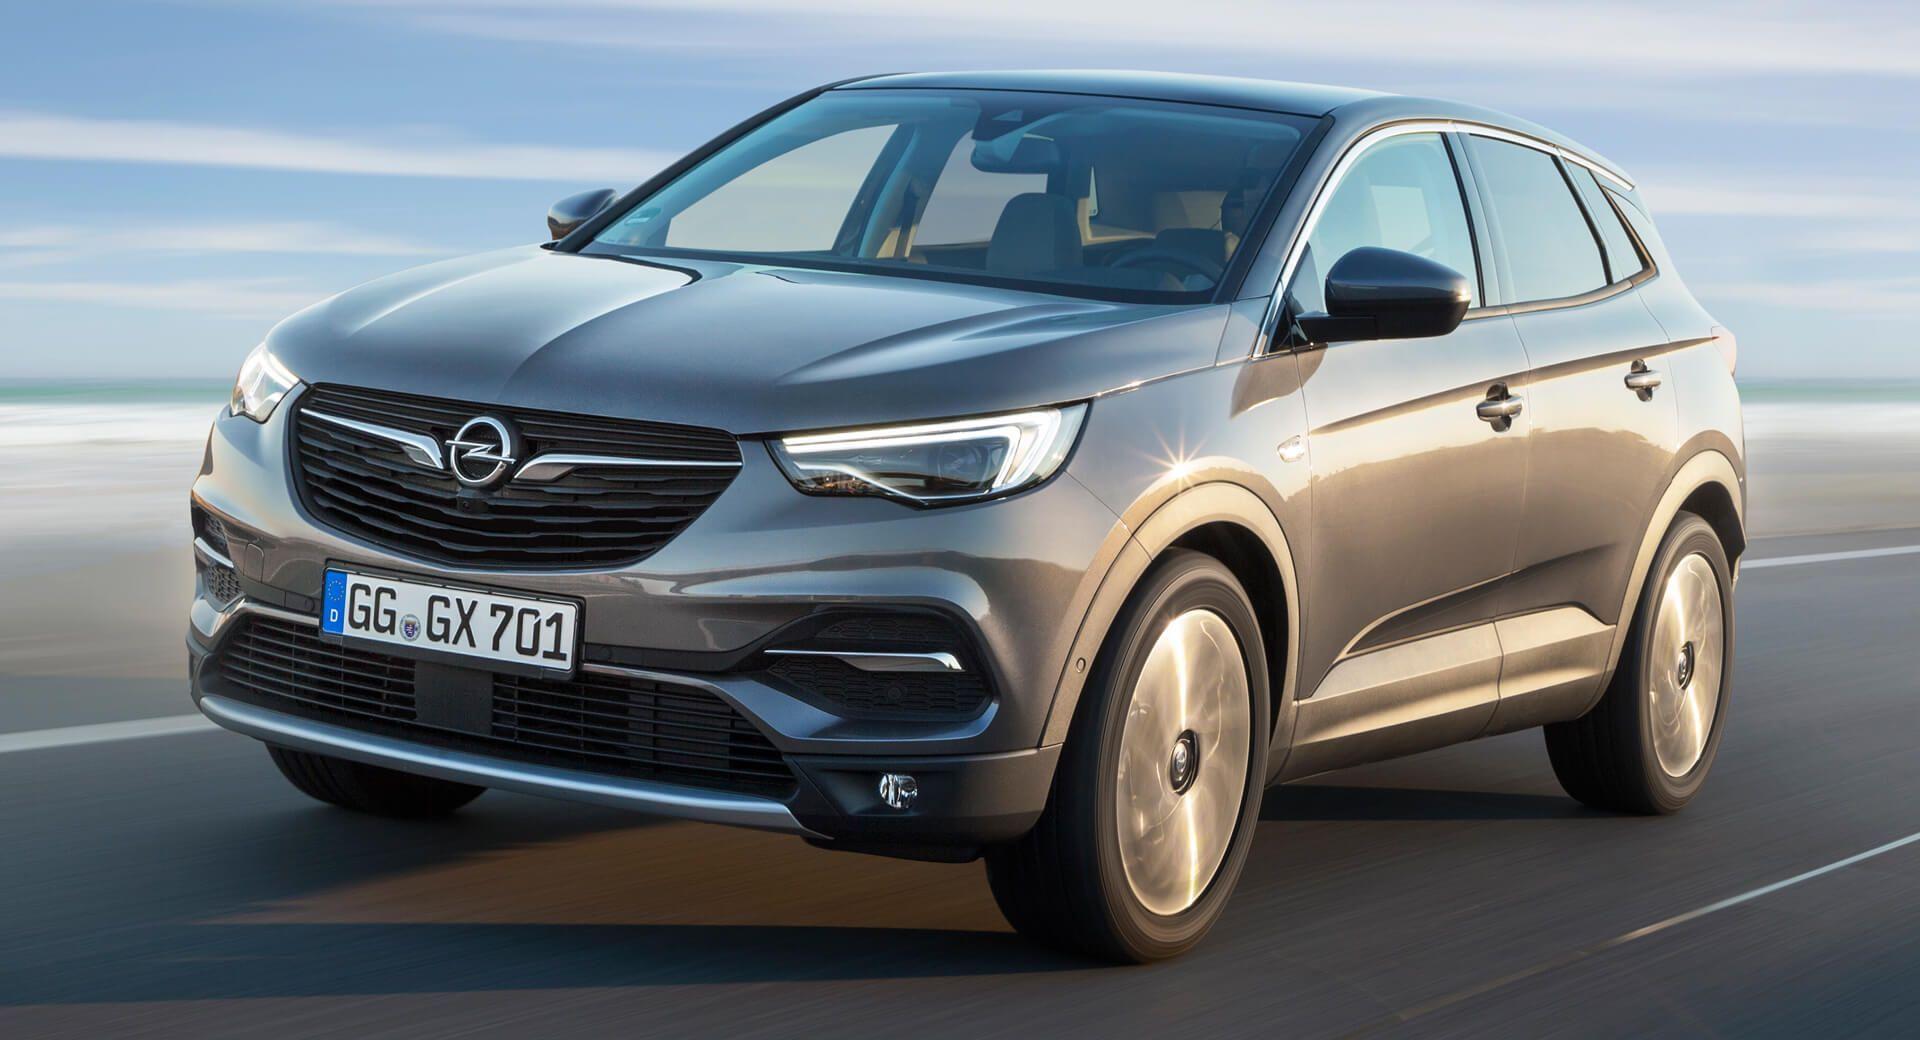 Opel Grandland X Gains New Psa Diesel Engine Phev Option From 2020 Carscoops Diesel Engine Opel Suv